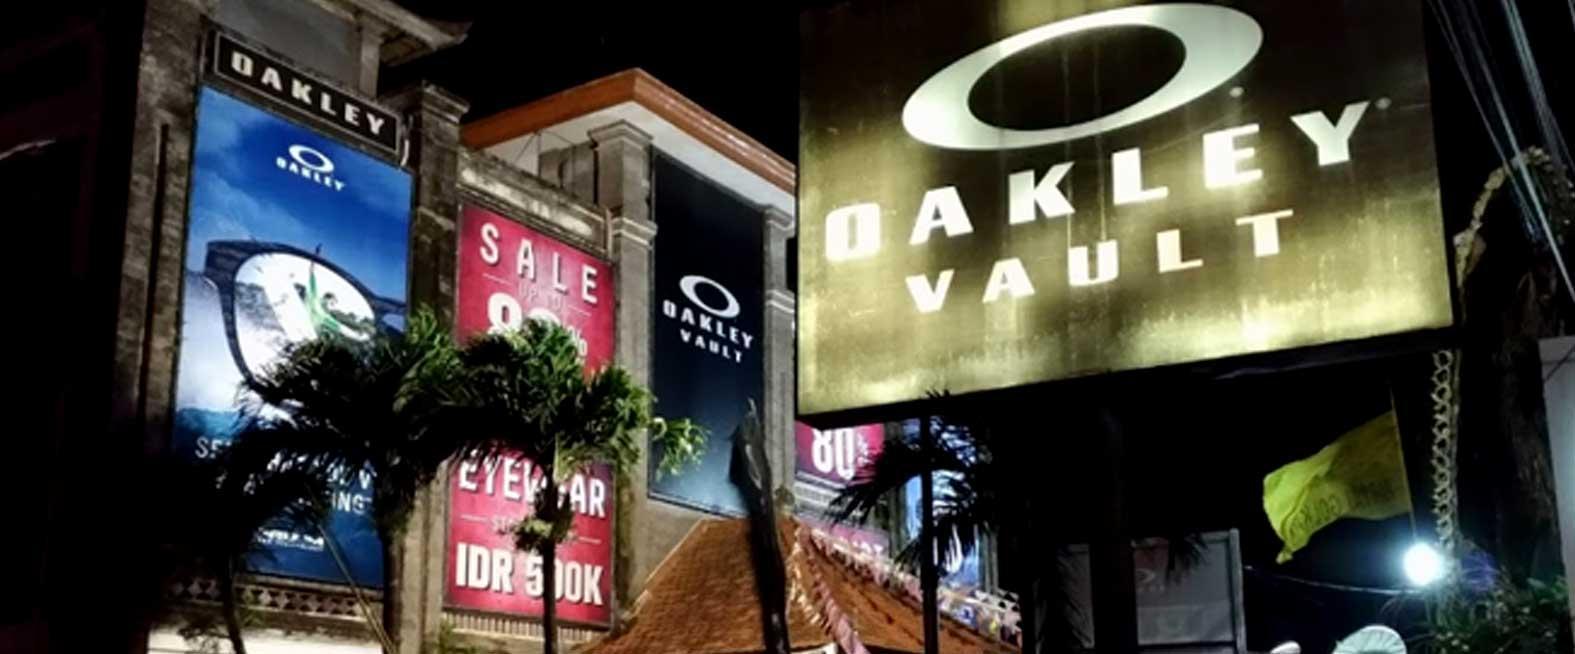 Oakley Vault Nusa Dua